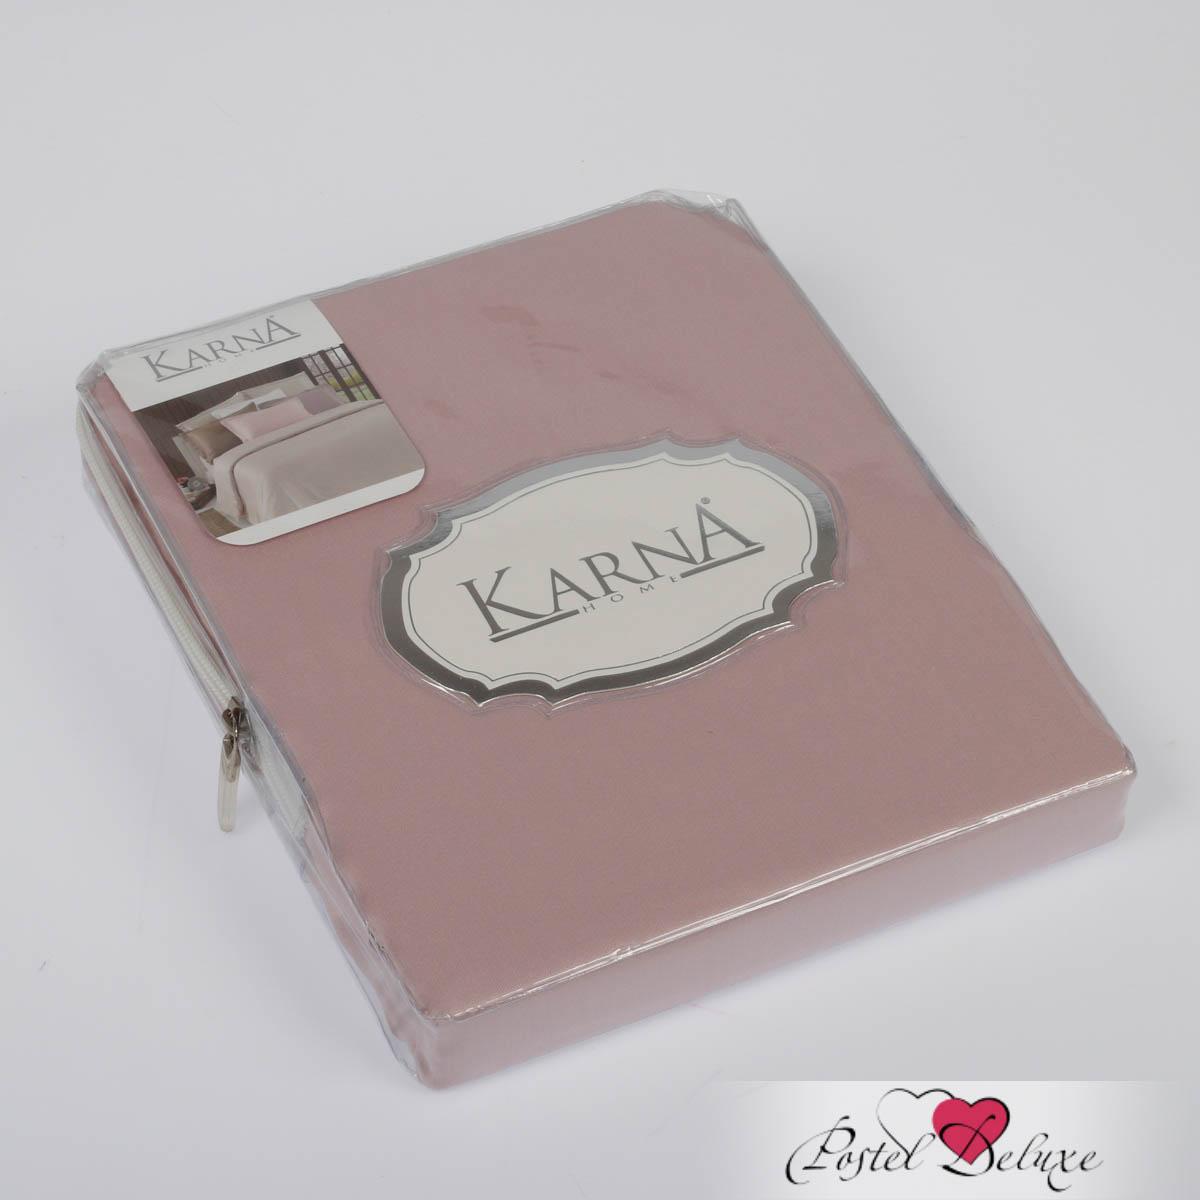 Пододеяльники Karna Пододеяльник Servan Цвет: Пудра (200х220 см) покрывало karna rose с вышивкой пудра 200х220 см